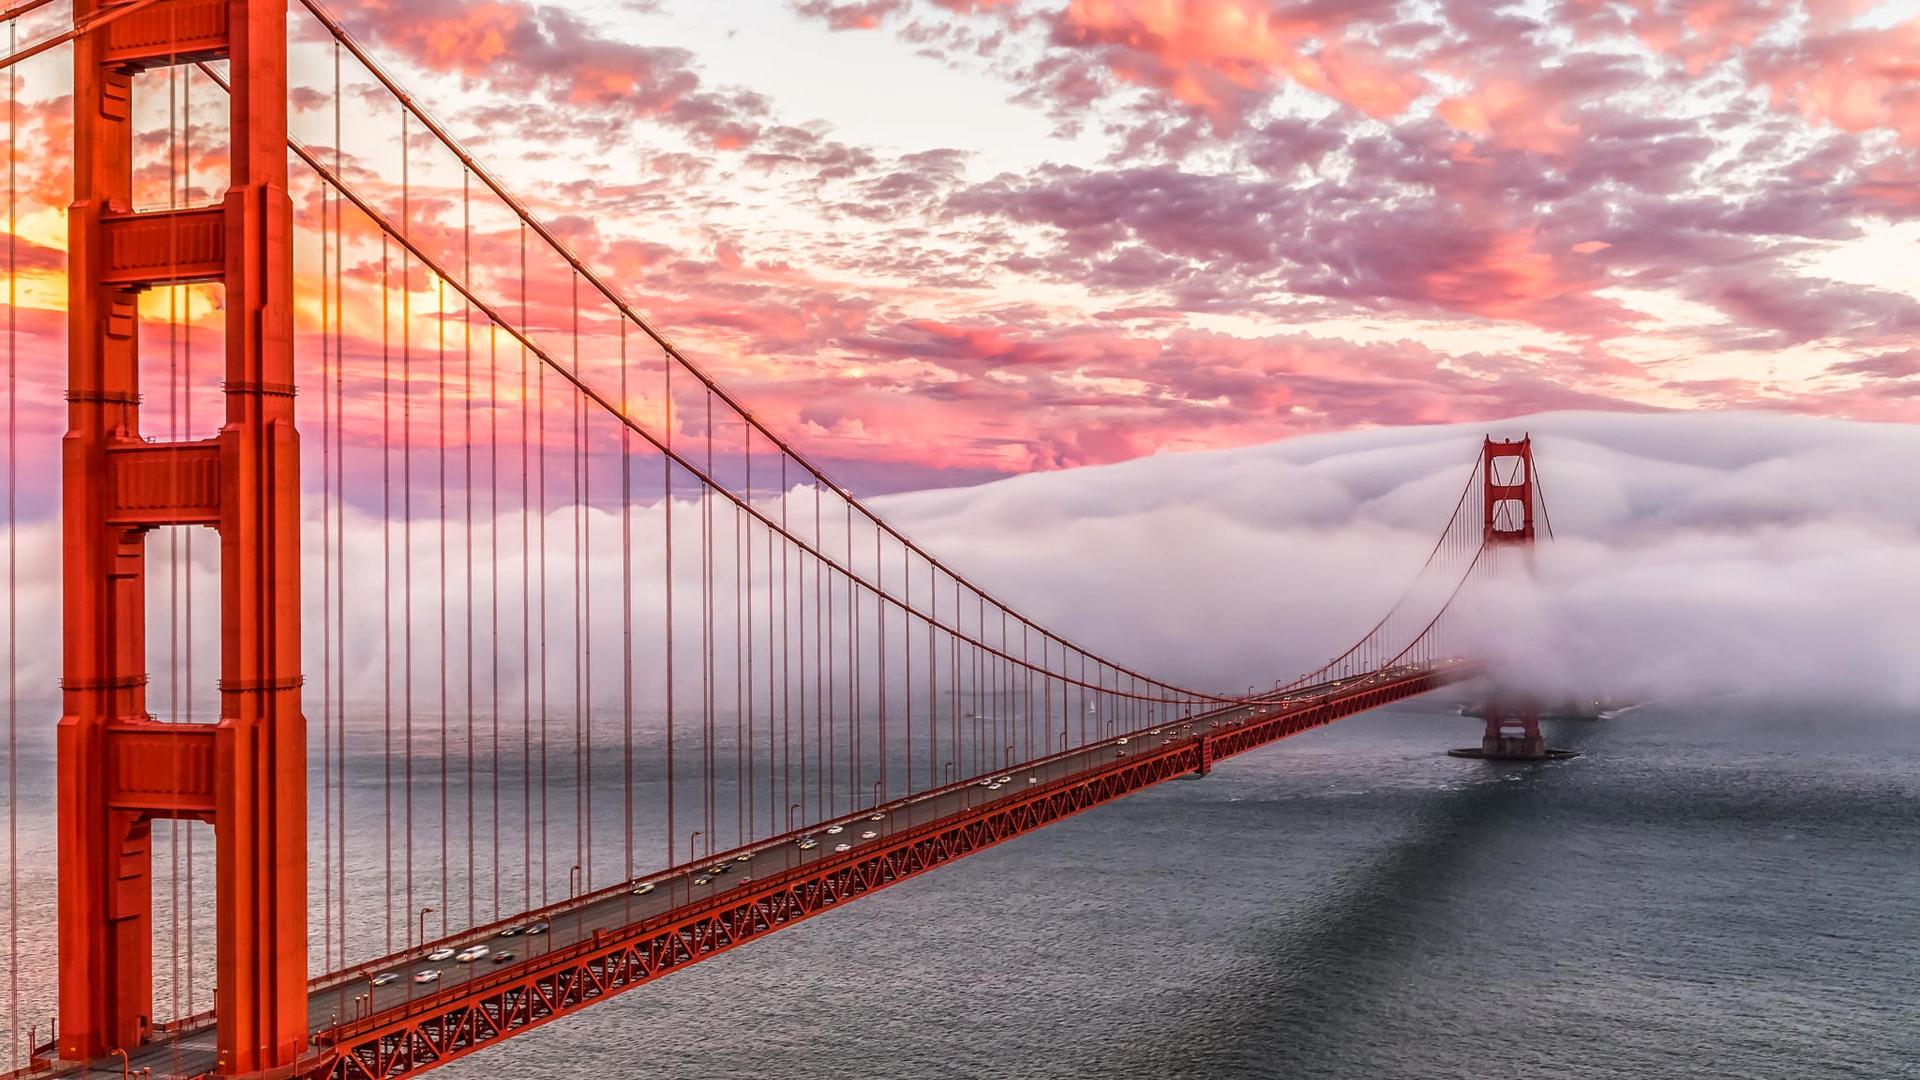 Audi San Francisco >> Golden Gate Bridge in fog in San Francisco